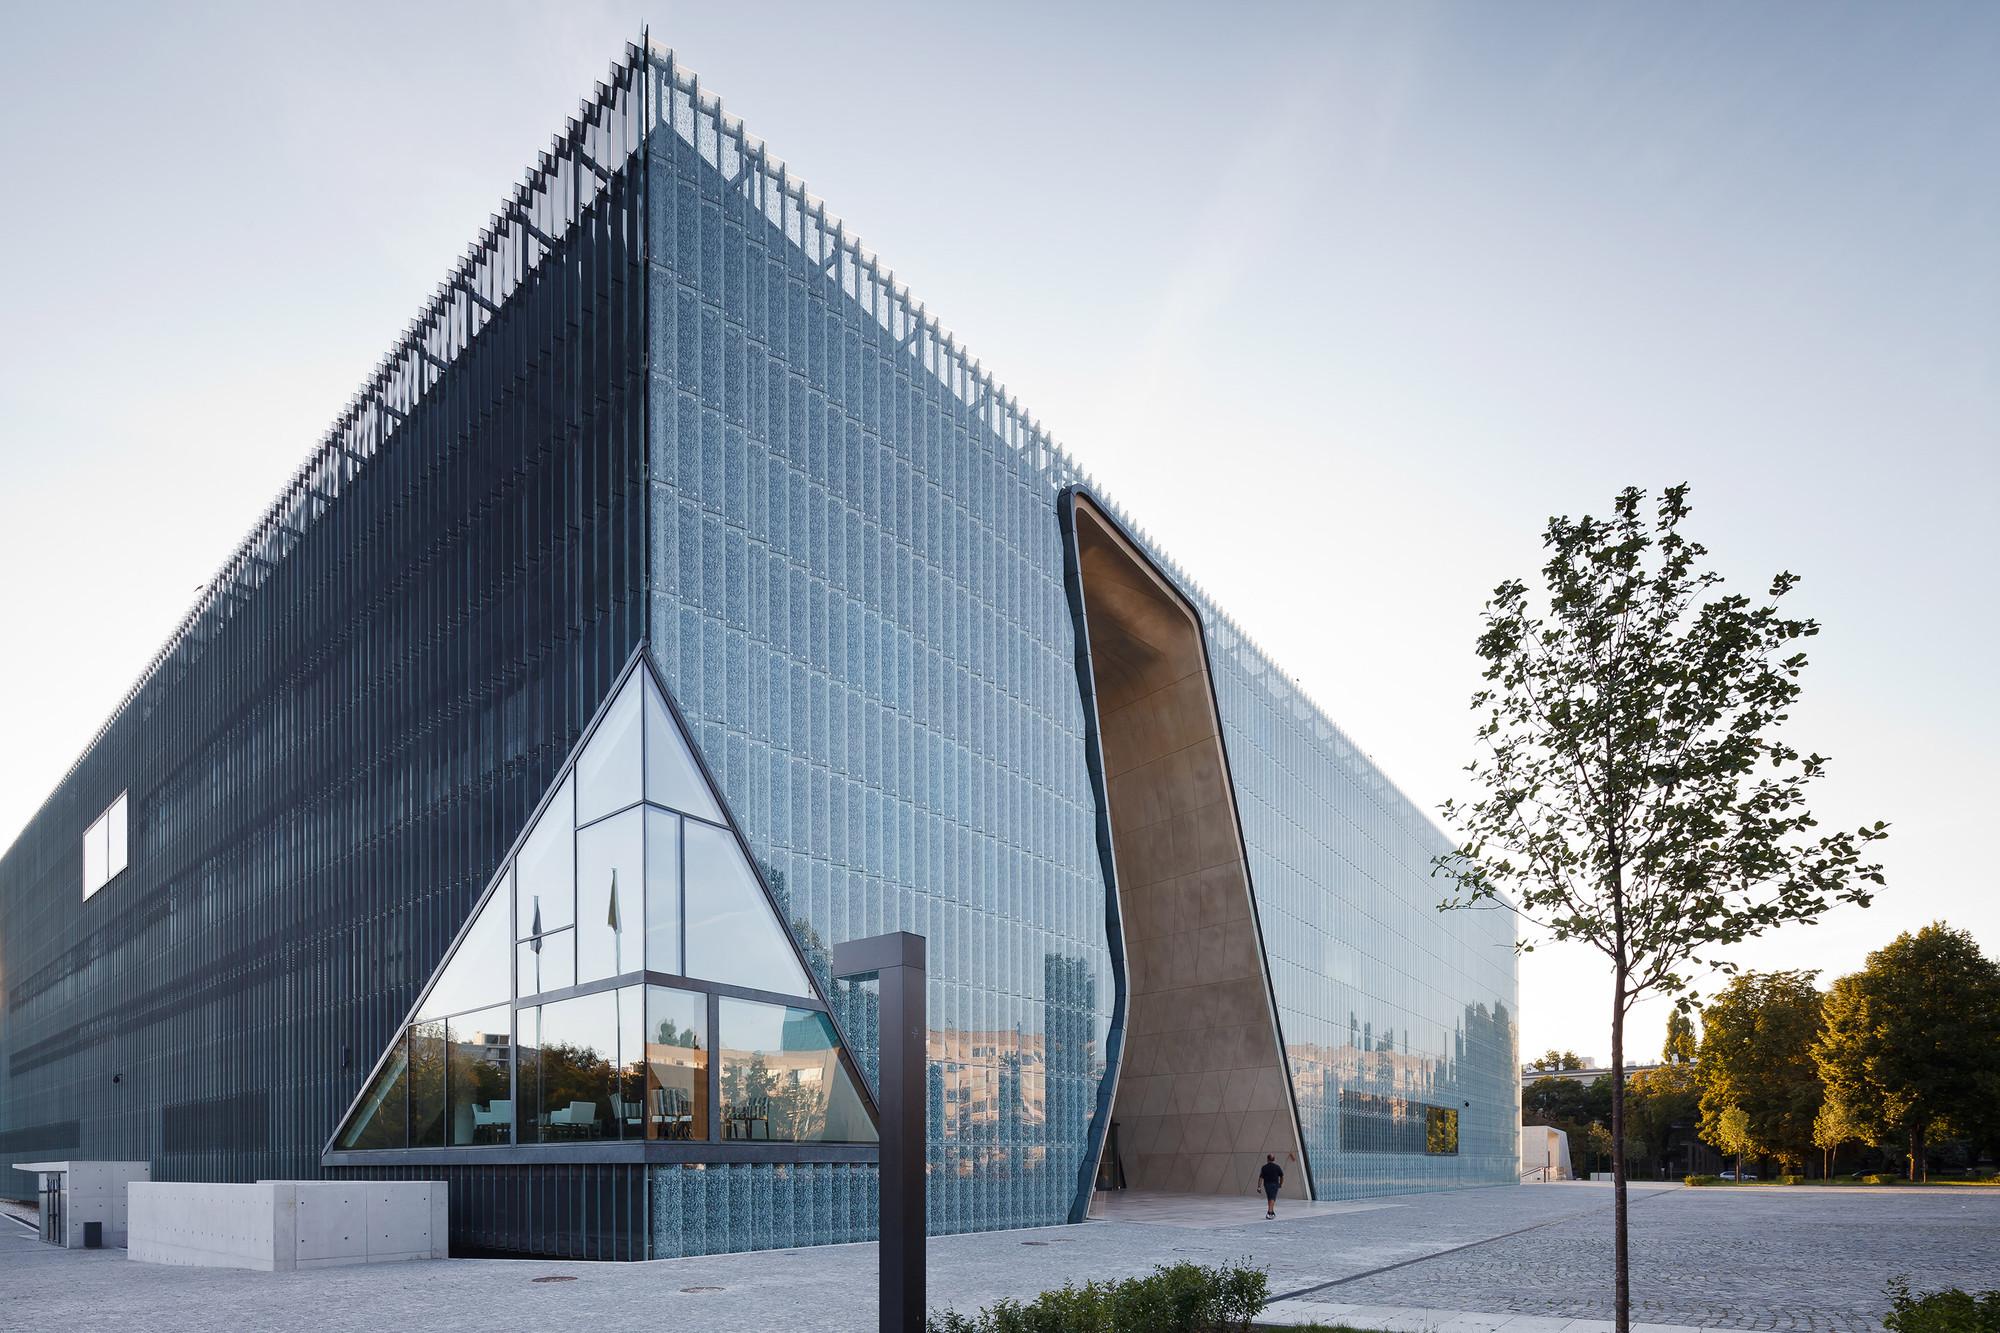 Museo de la Historia de Judios Polacos / Lahdelma & Mahlamäki + Kuryłowicz & Associates, © Pawel Paniczko